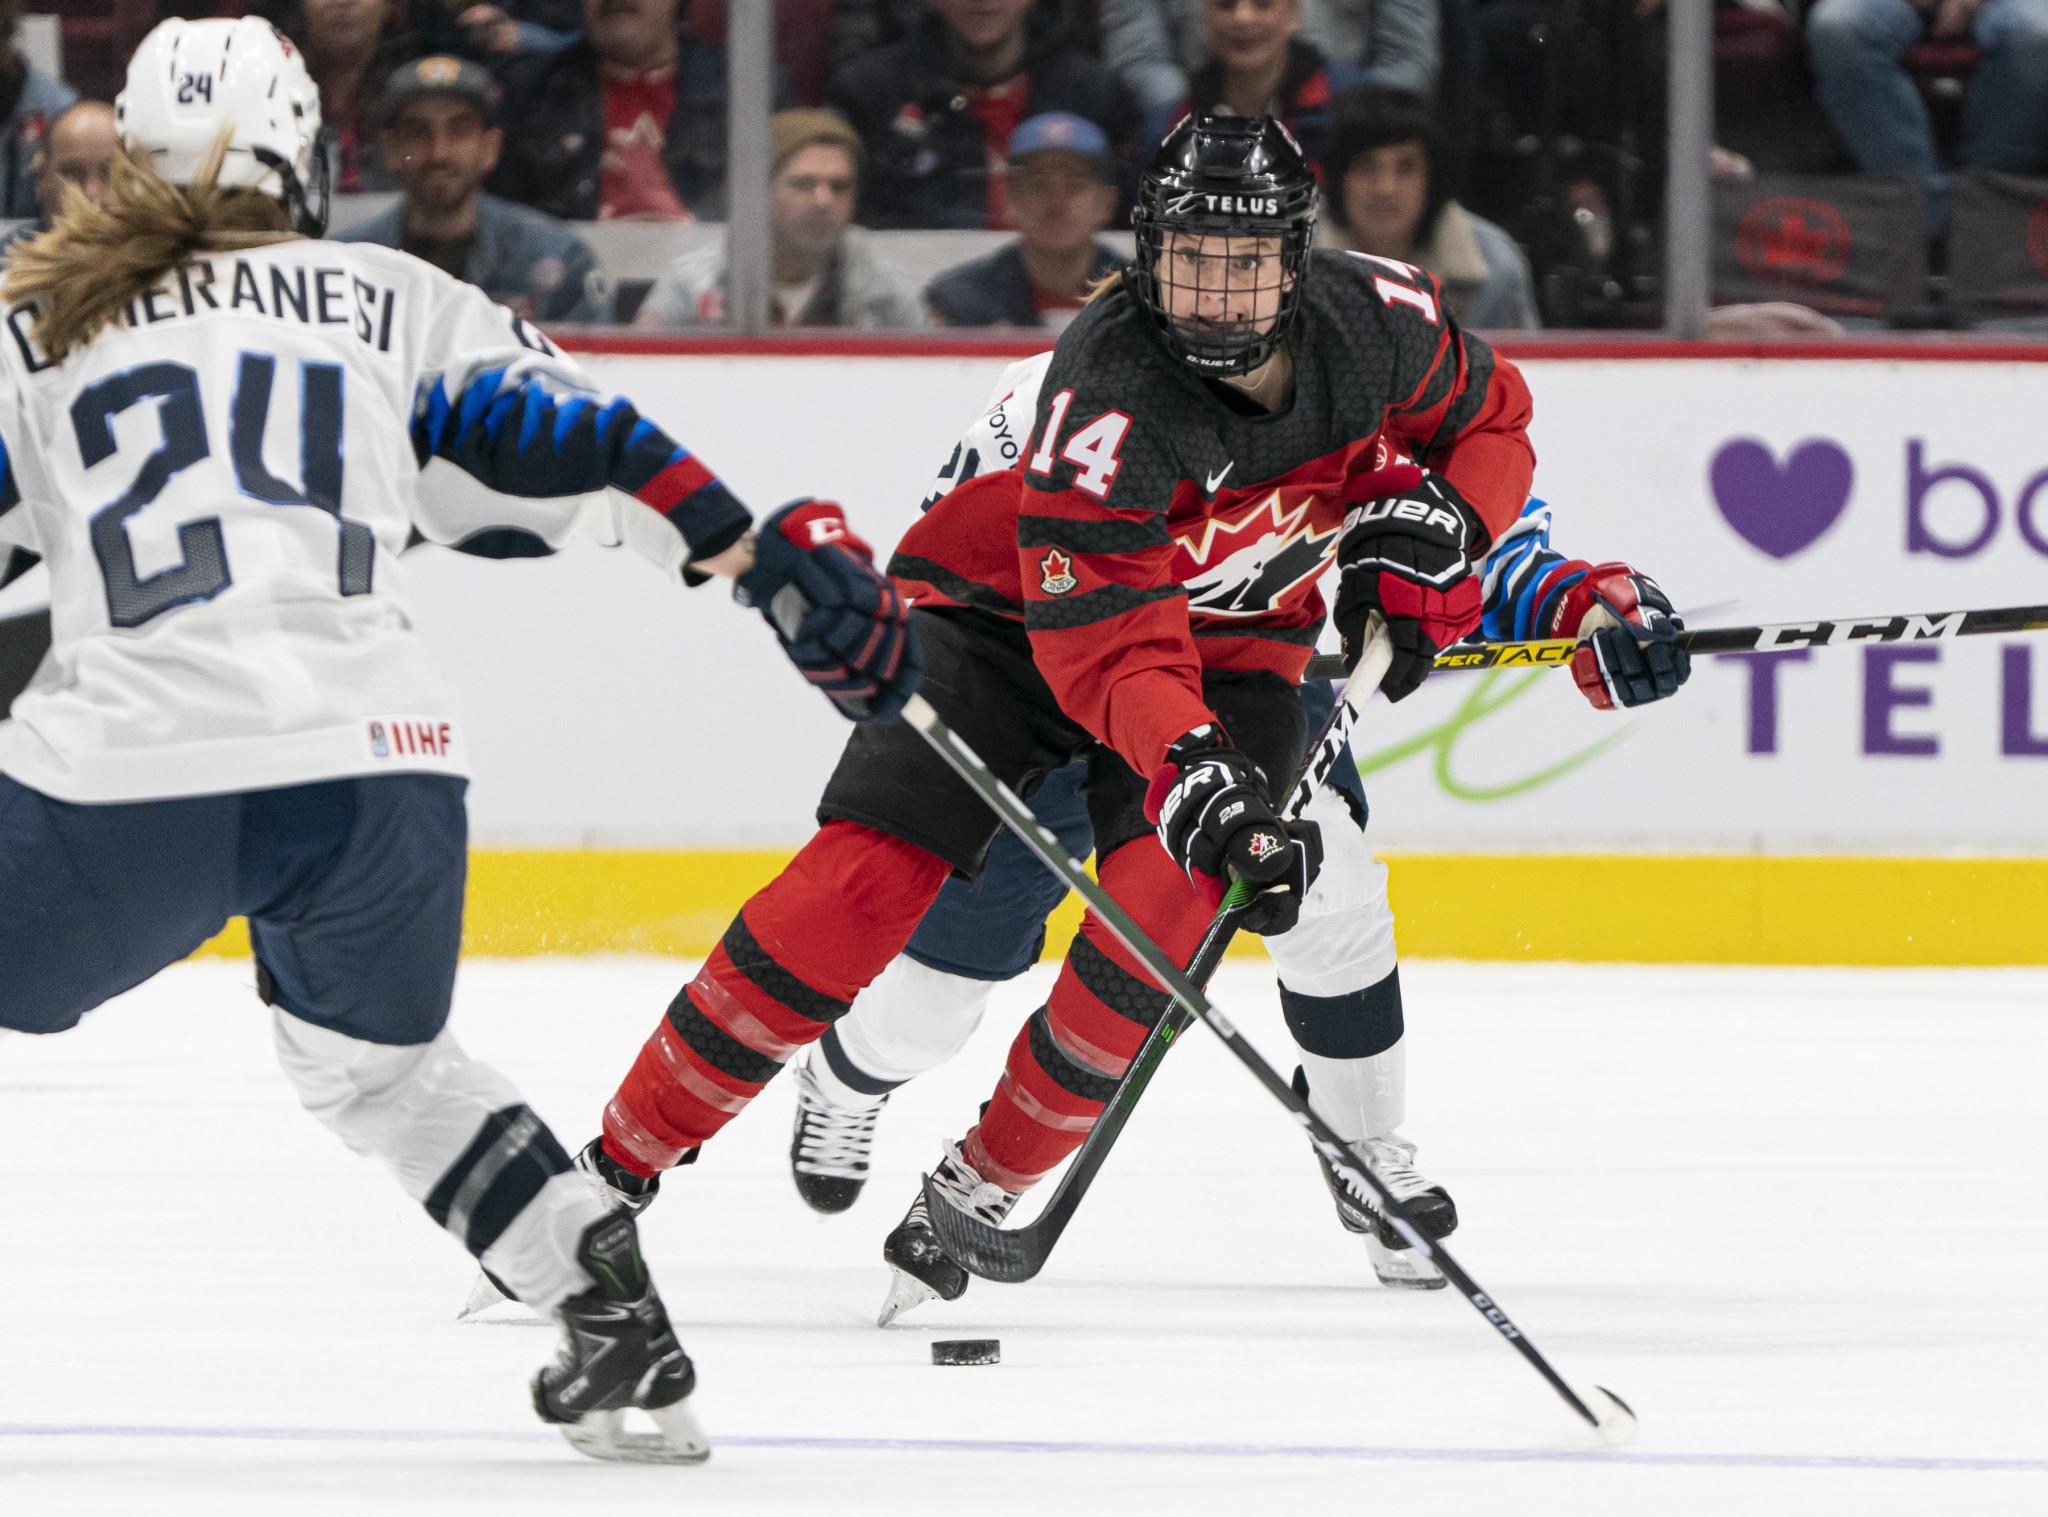 Delayed IIHF Women's World Championship poised to begin in Calgary